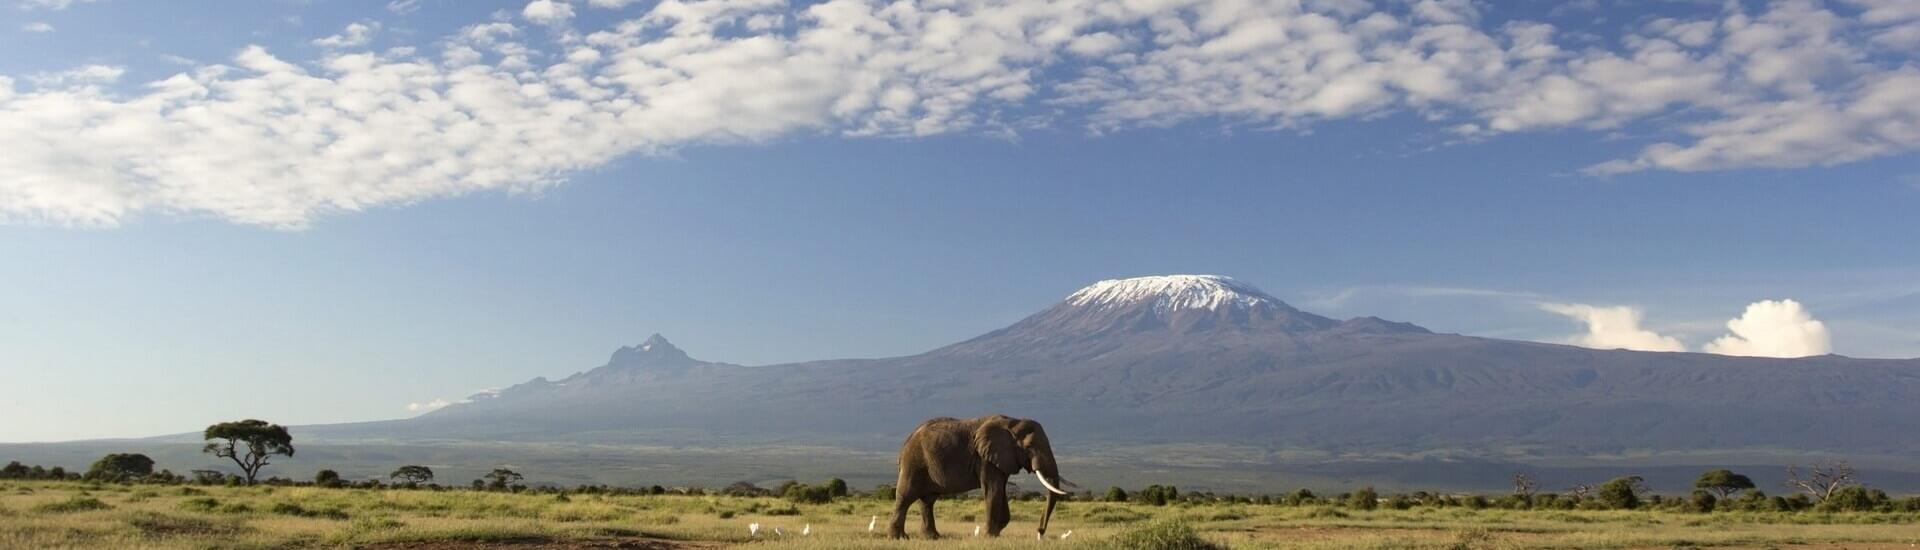 Nyika Discovery, Tanzania - Contact us